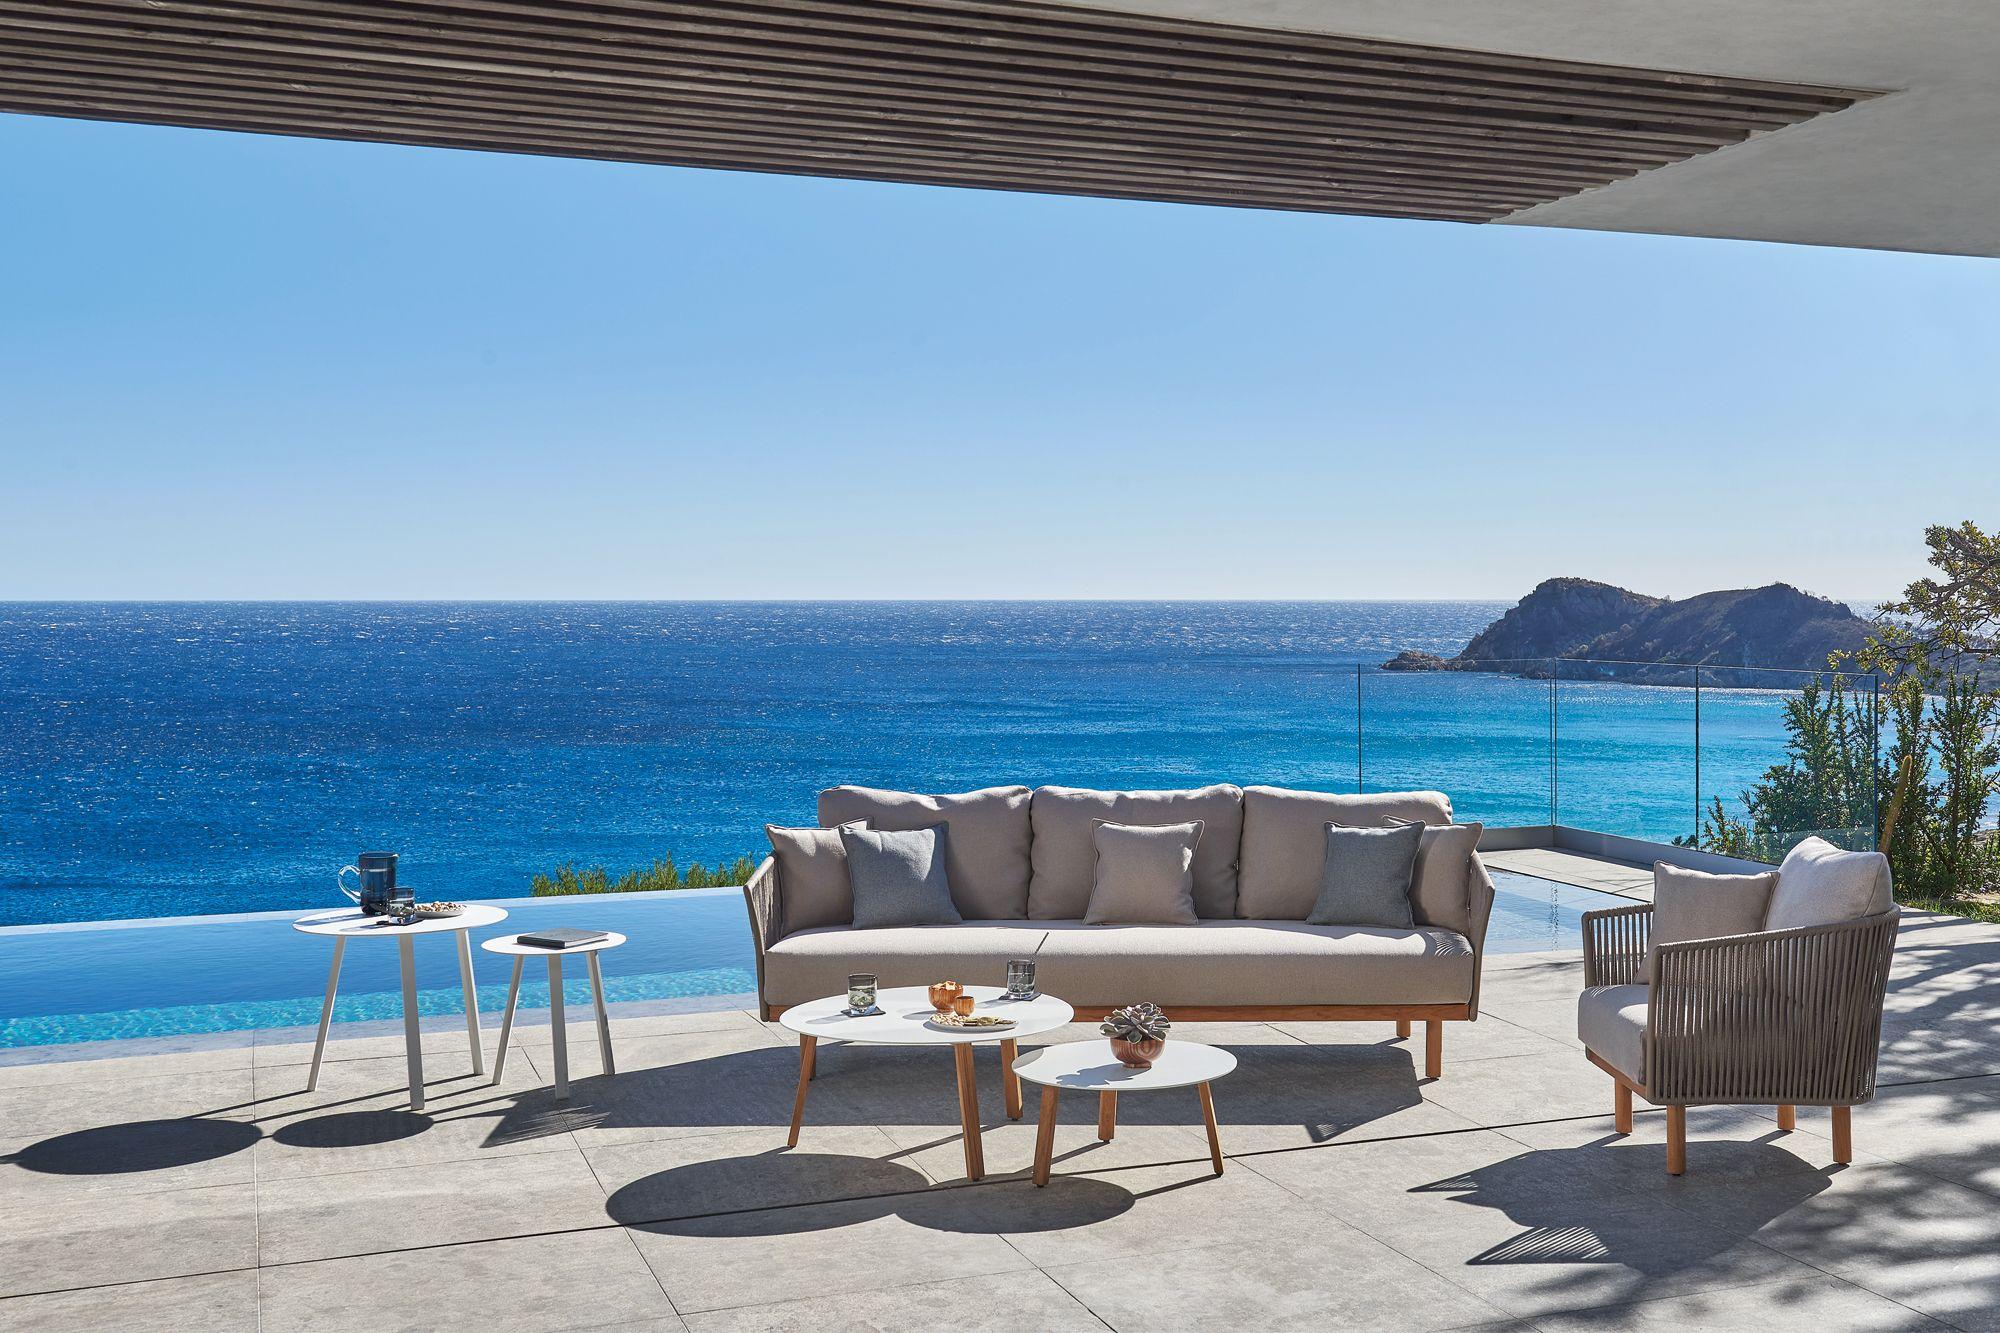 Diphano Newport outdoor sofa, from Danish Design Co